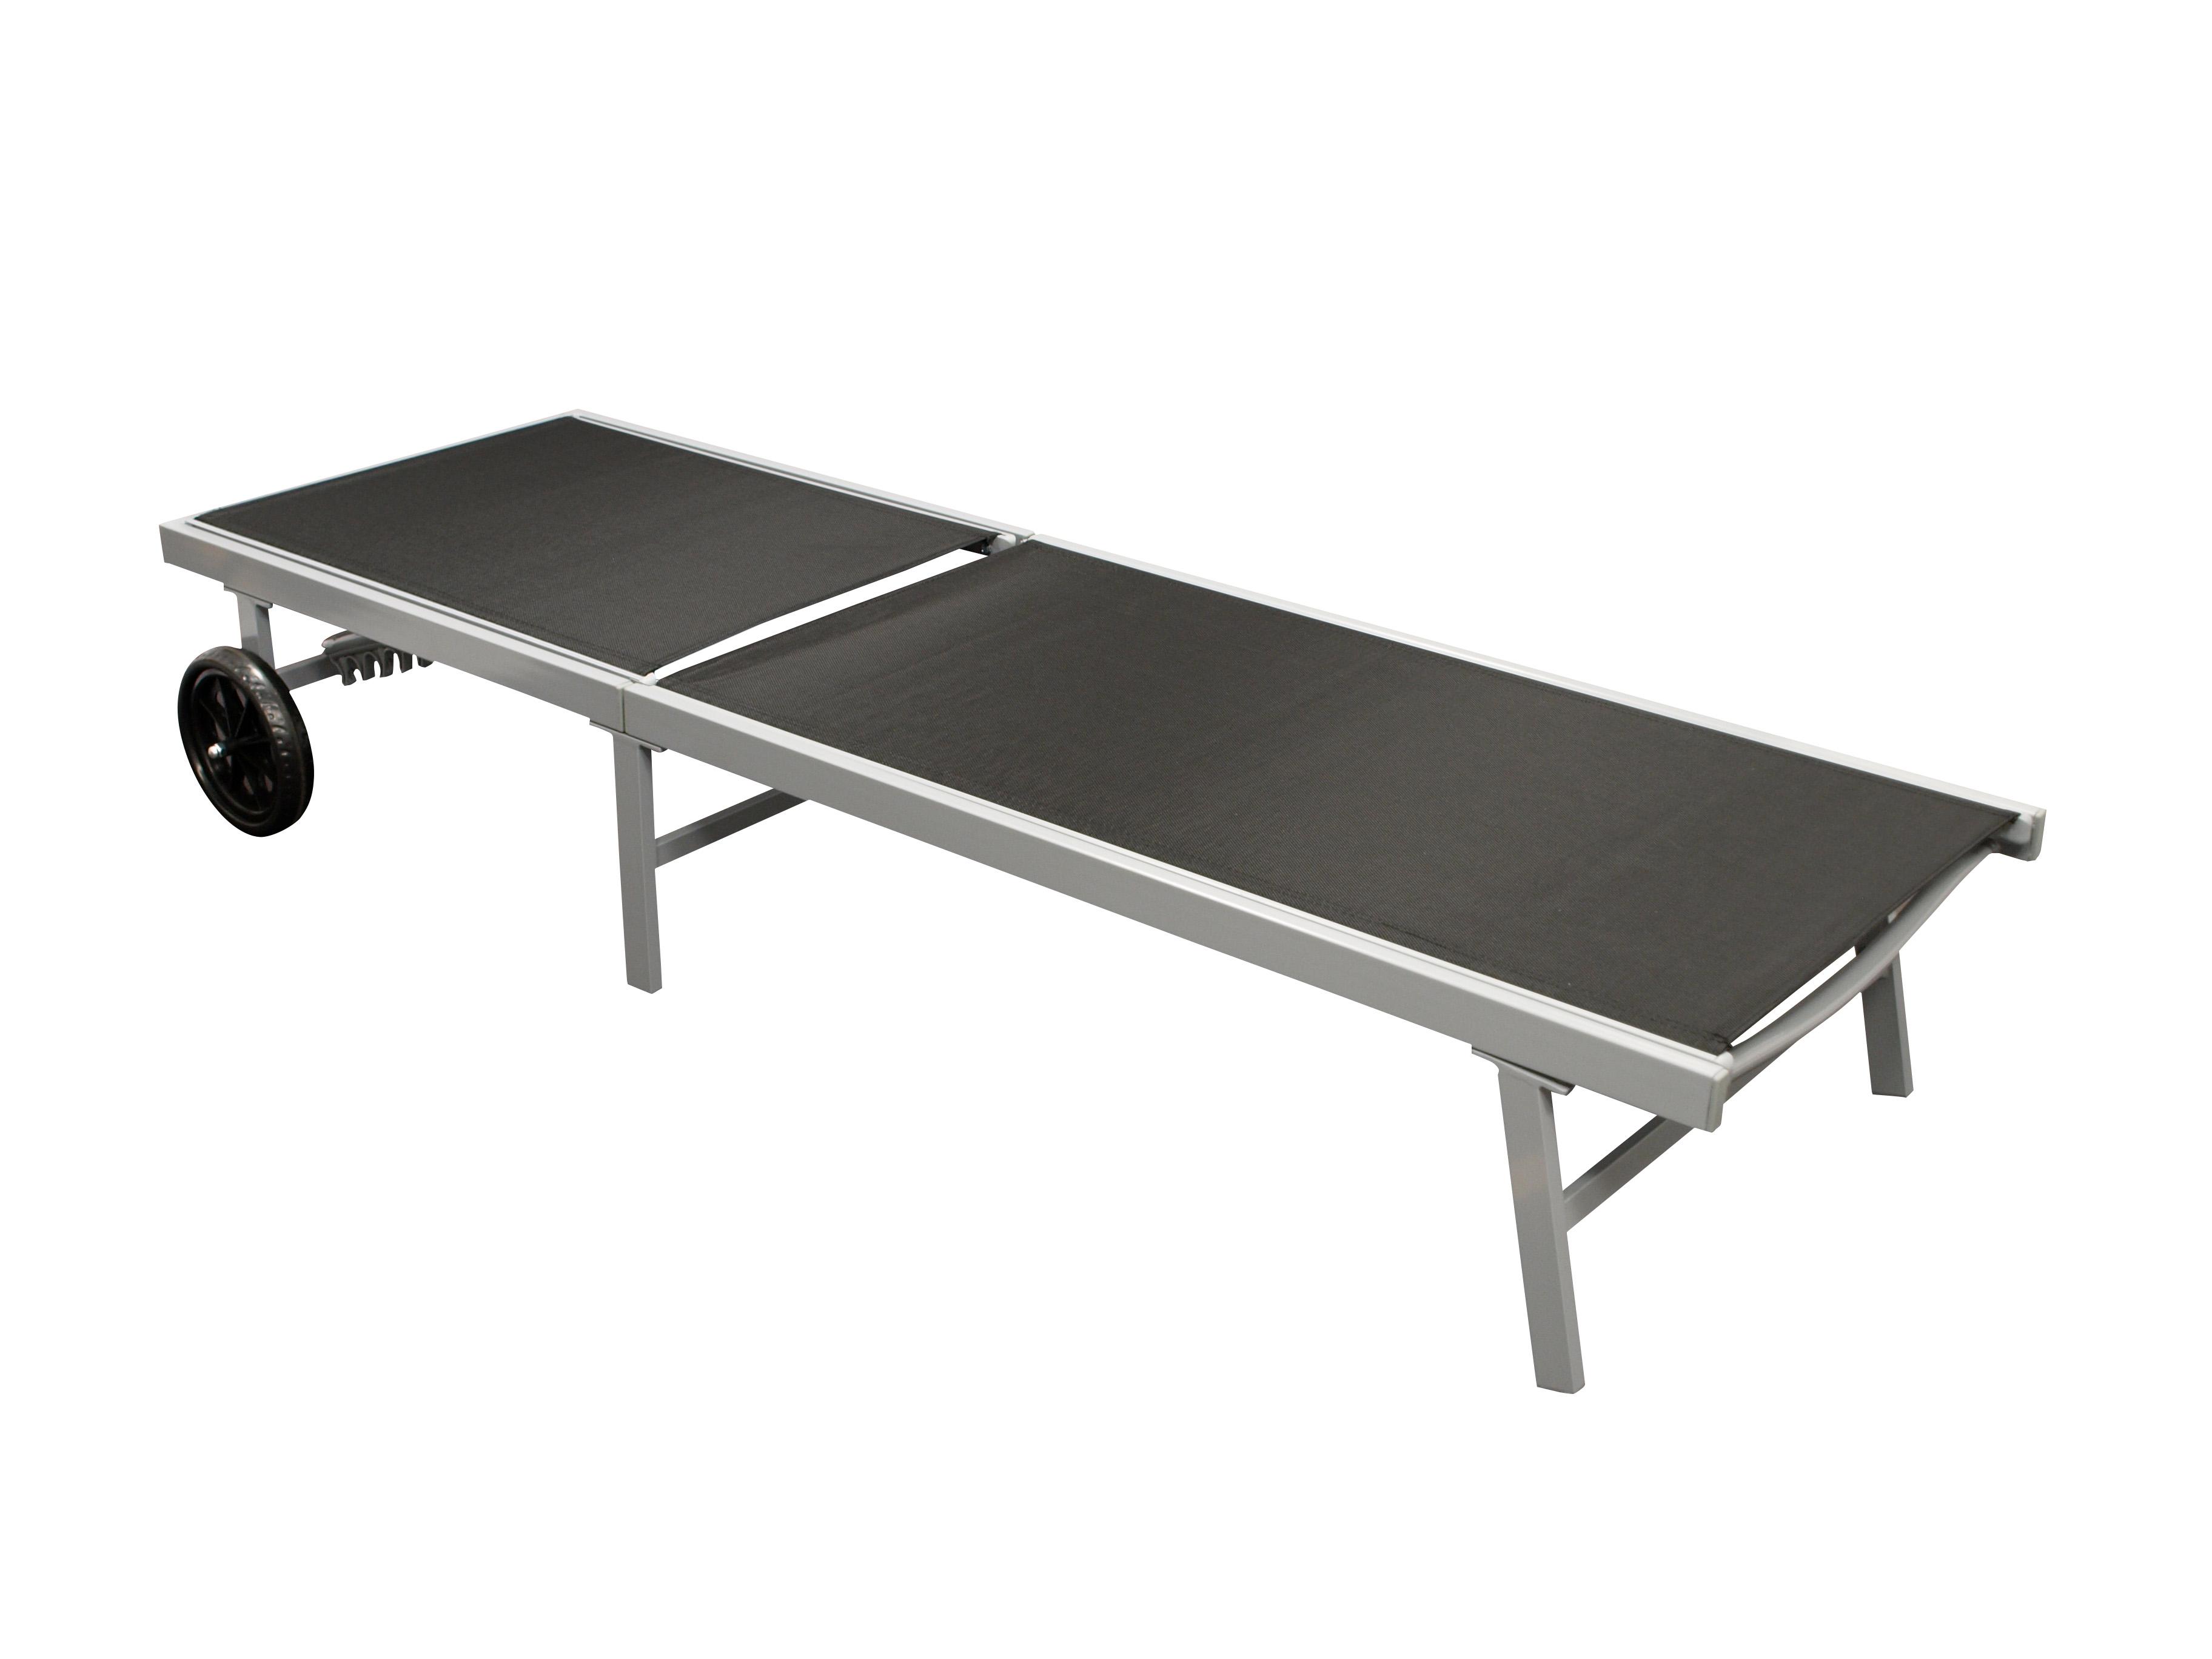 Rollenliege OSTIA, Aluminium silber + Textilgewebe schwarz, 200cm